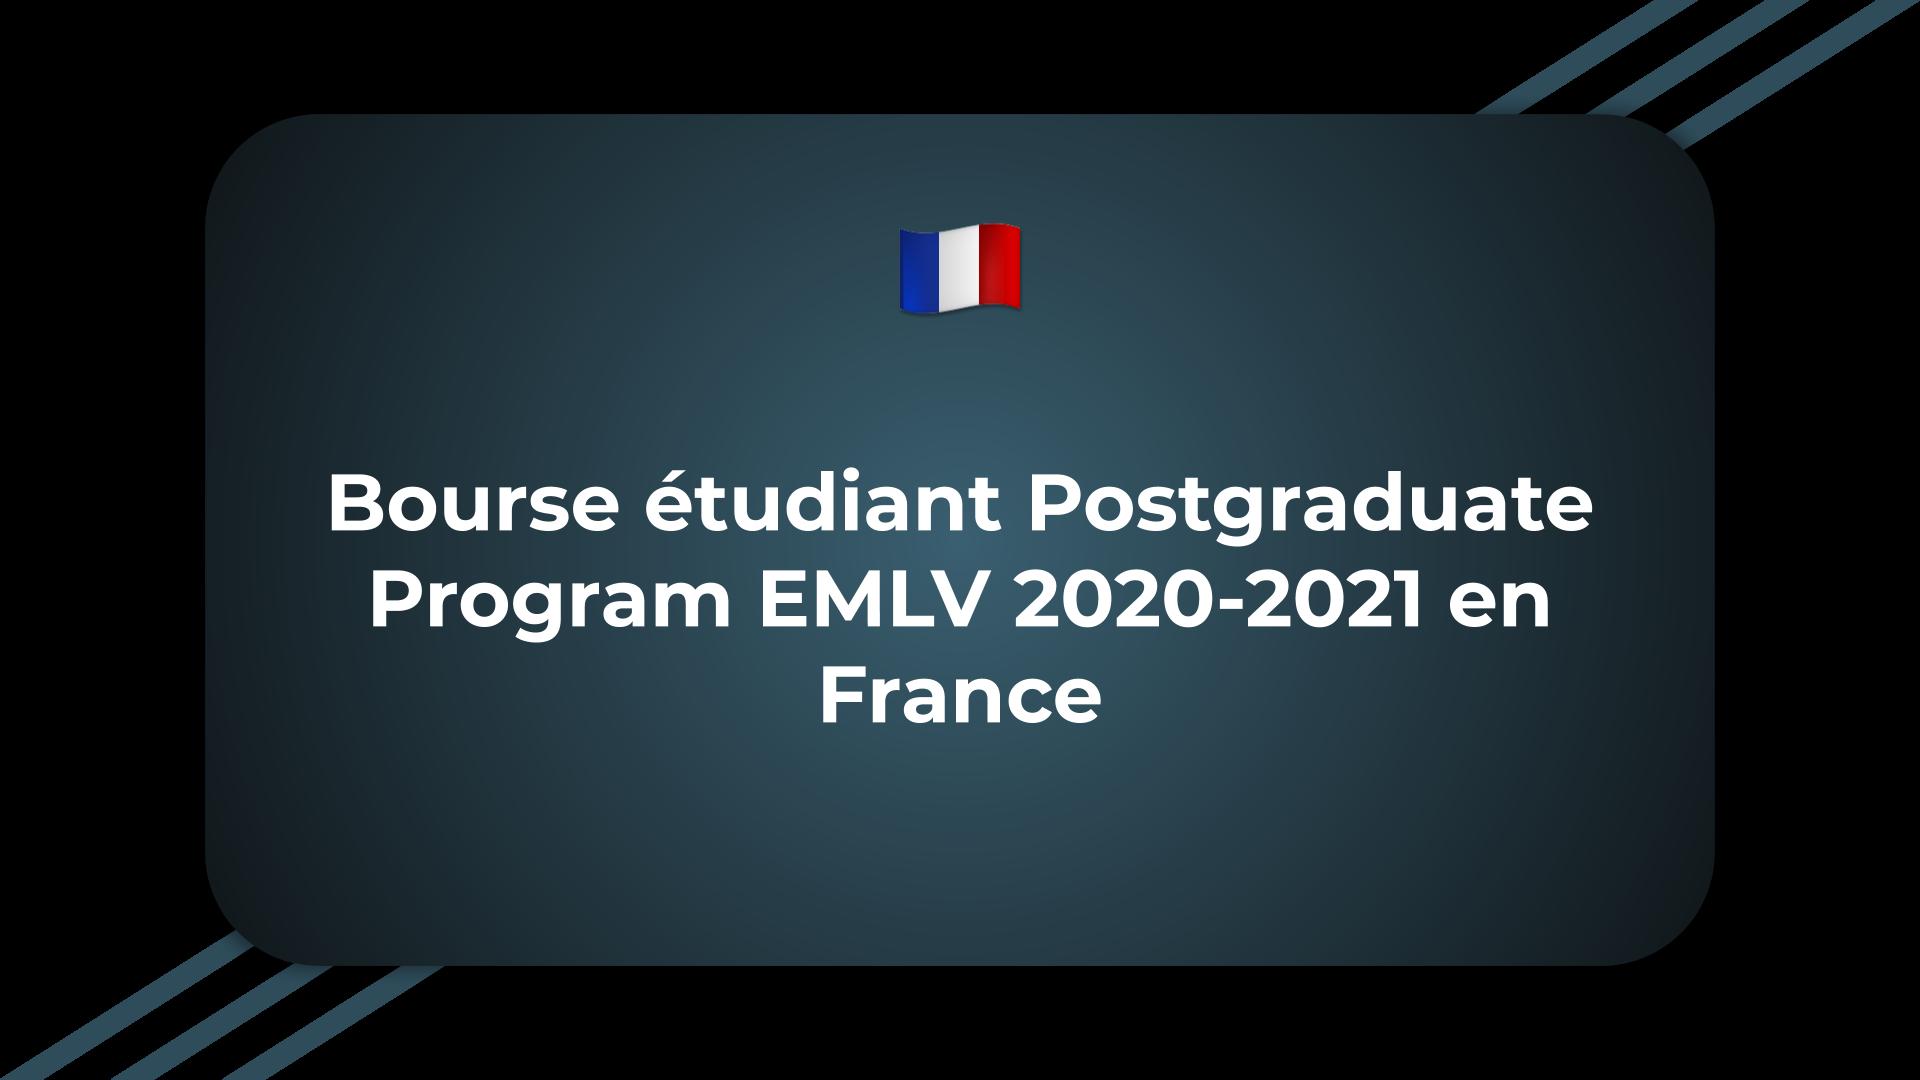 Bourse étudiant Postgraduate Program EMLV